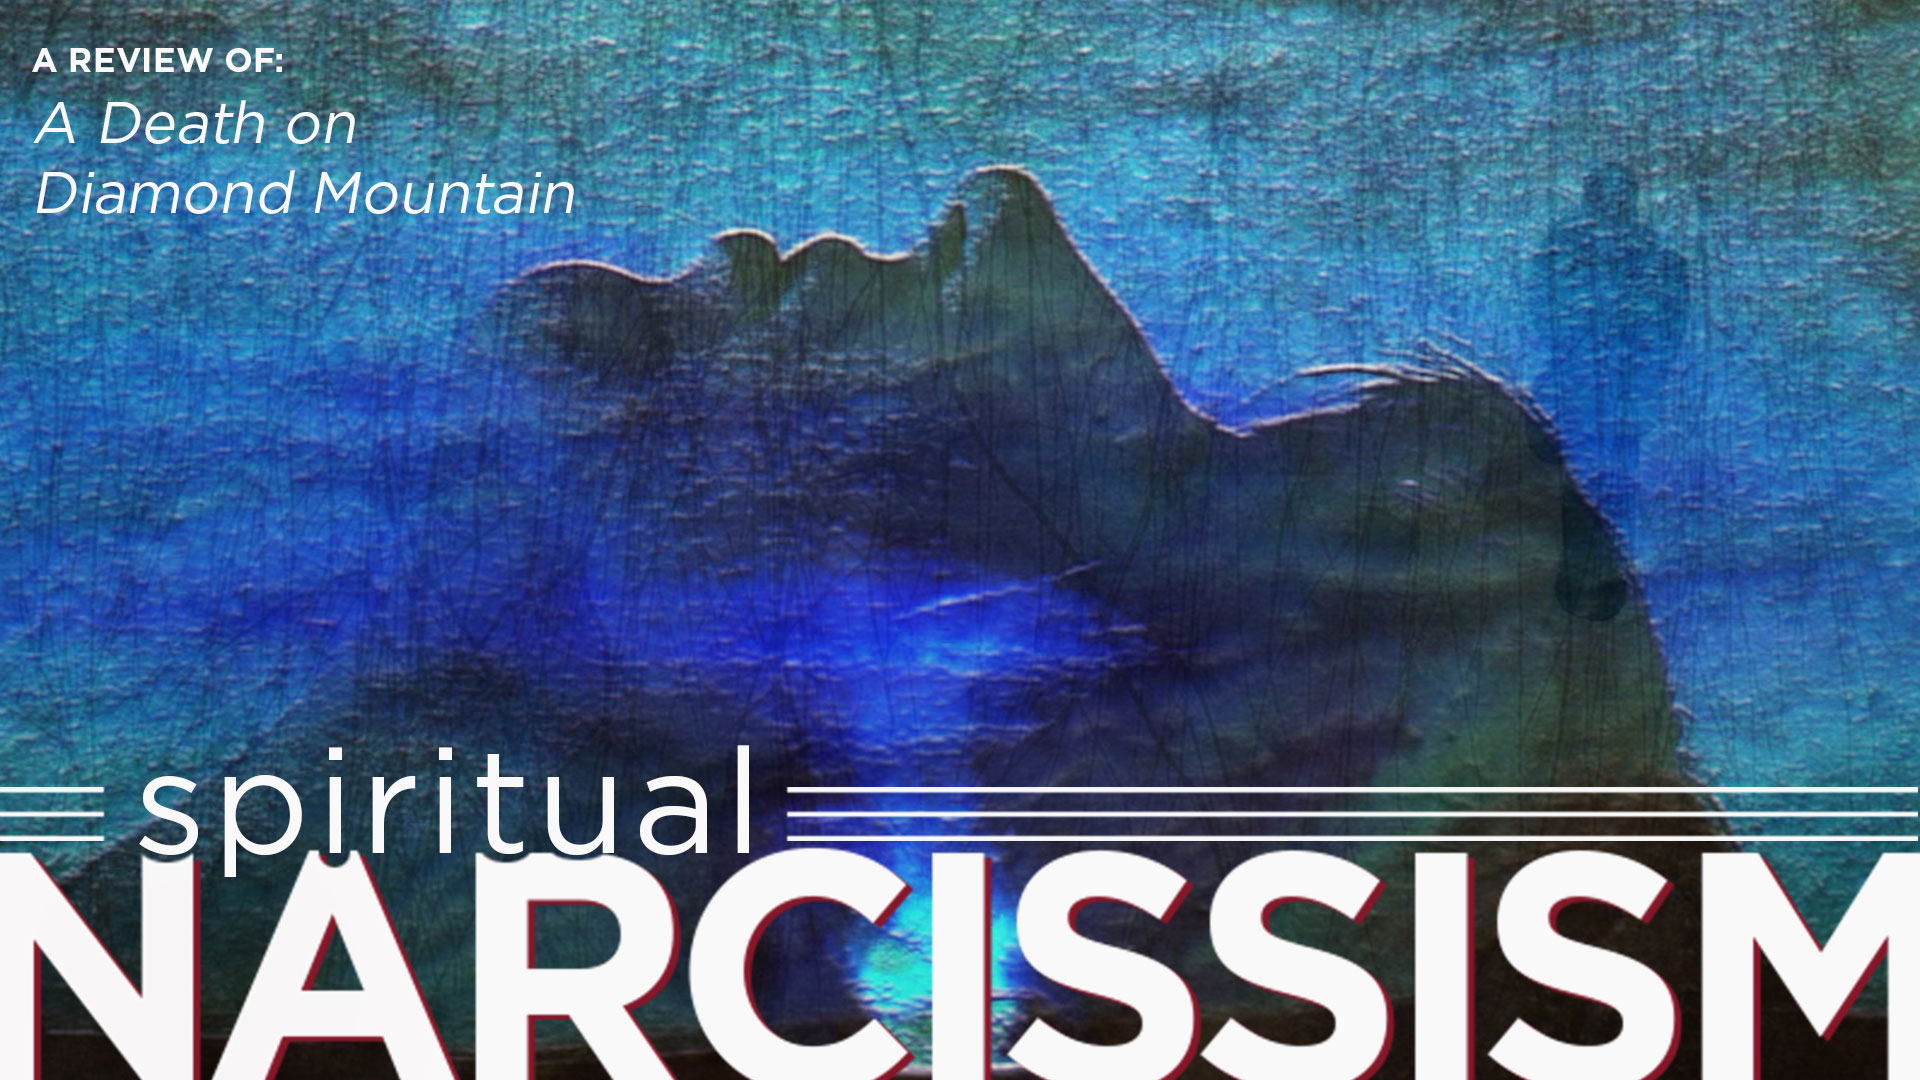 Spiritualized Narcissism as Trauma Response